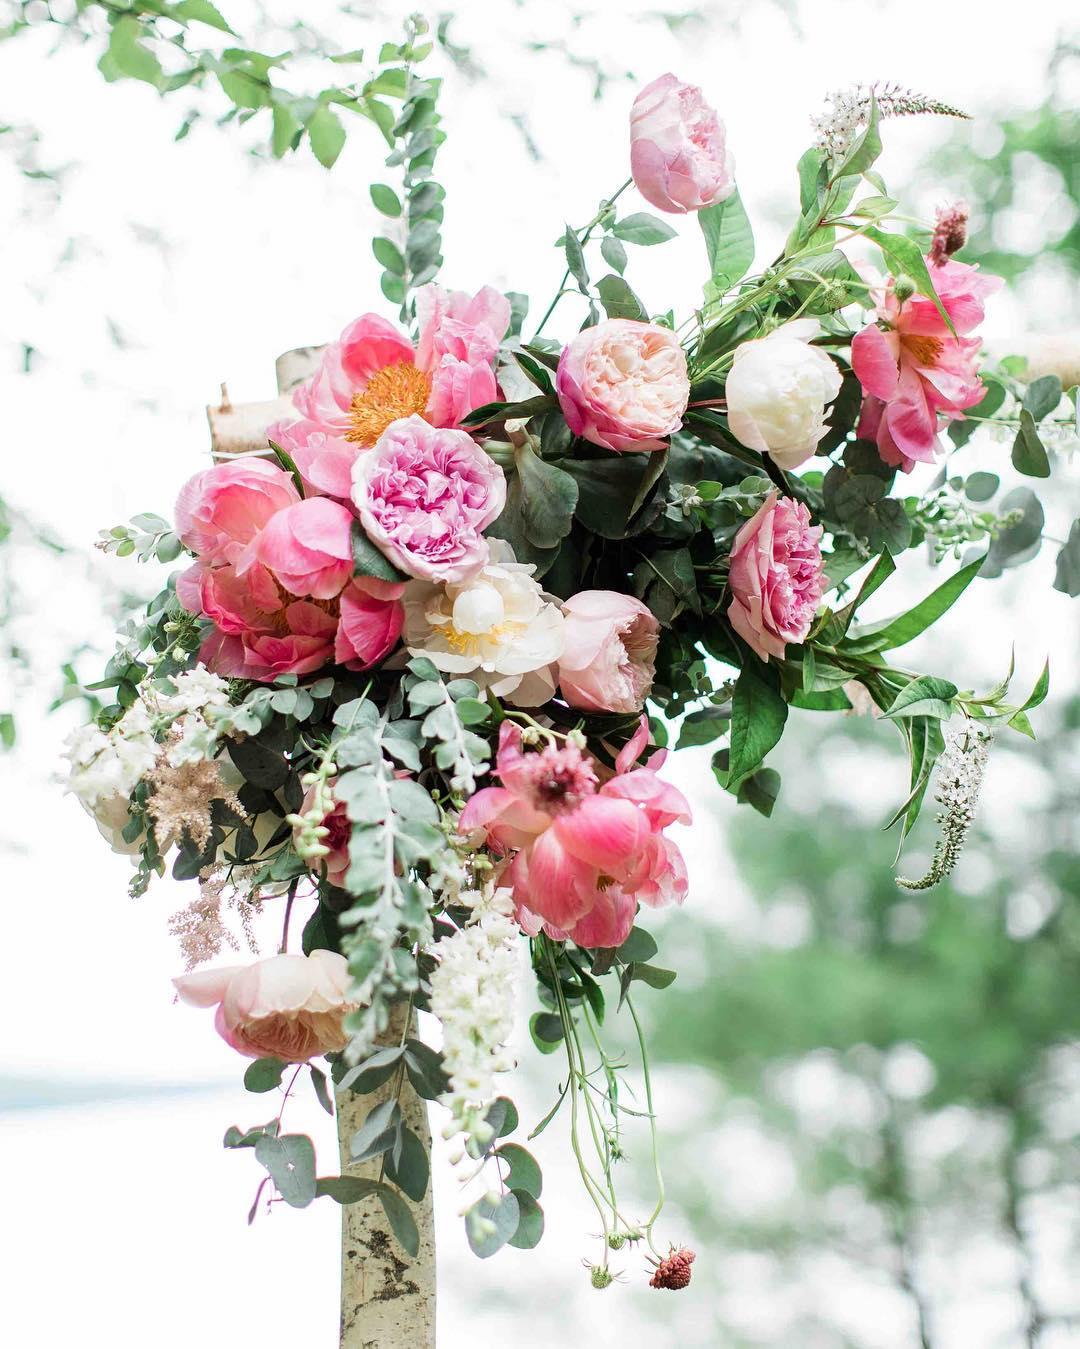 {arbor bling} photo | @jharperphoto  #ceremony #arbor #arborflowers #rusticwedding #woodlandwedding #whitebirch #peonies #pink #coral #gardenroses #lotusfloraldesigns #lovely